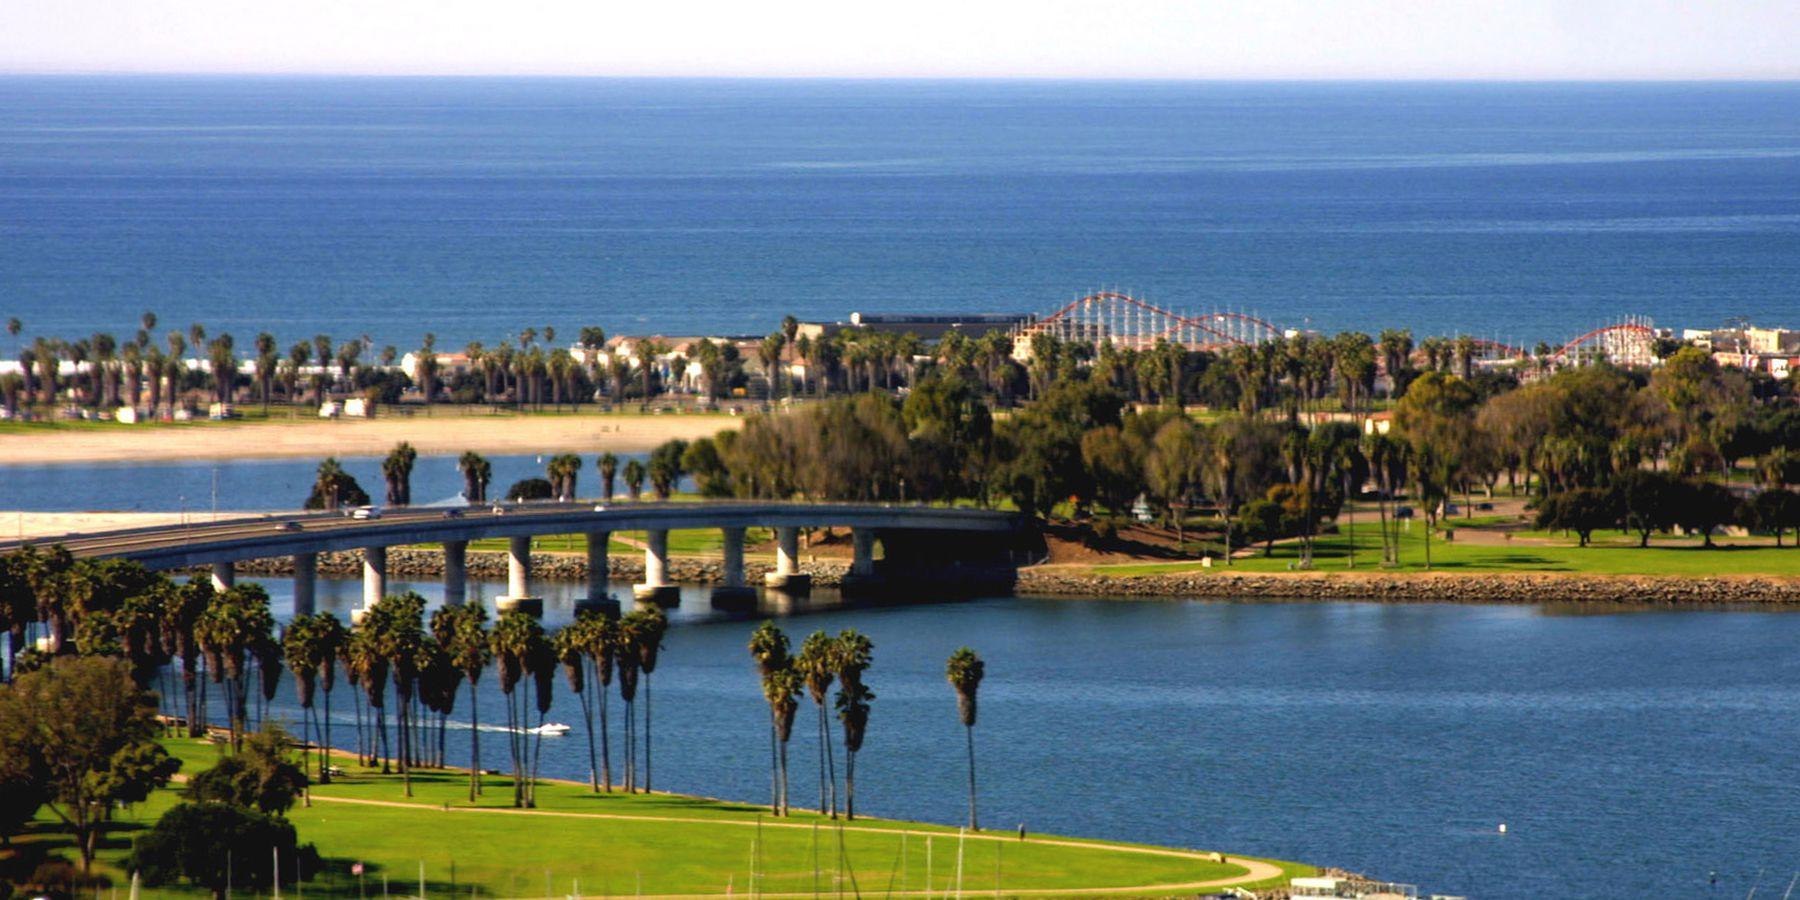 Mission Bay - San Diego - California - Amerika - Doets Reizen